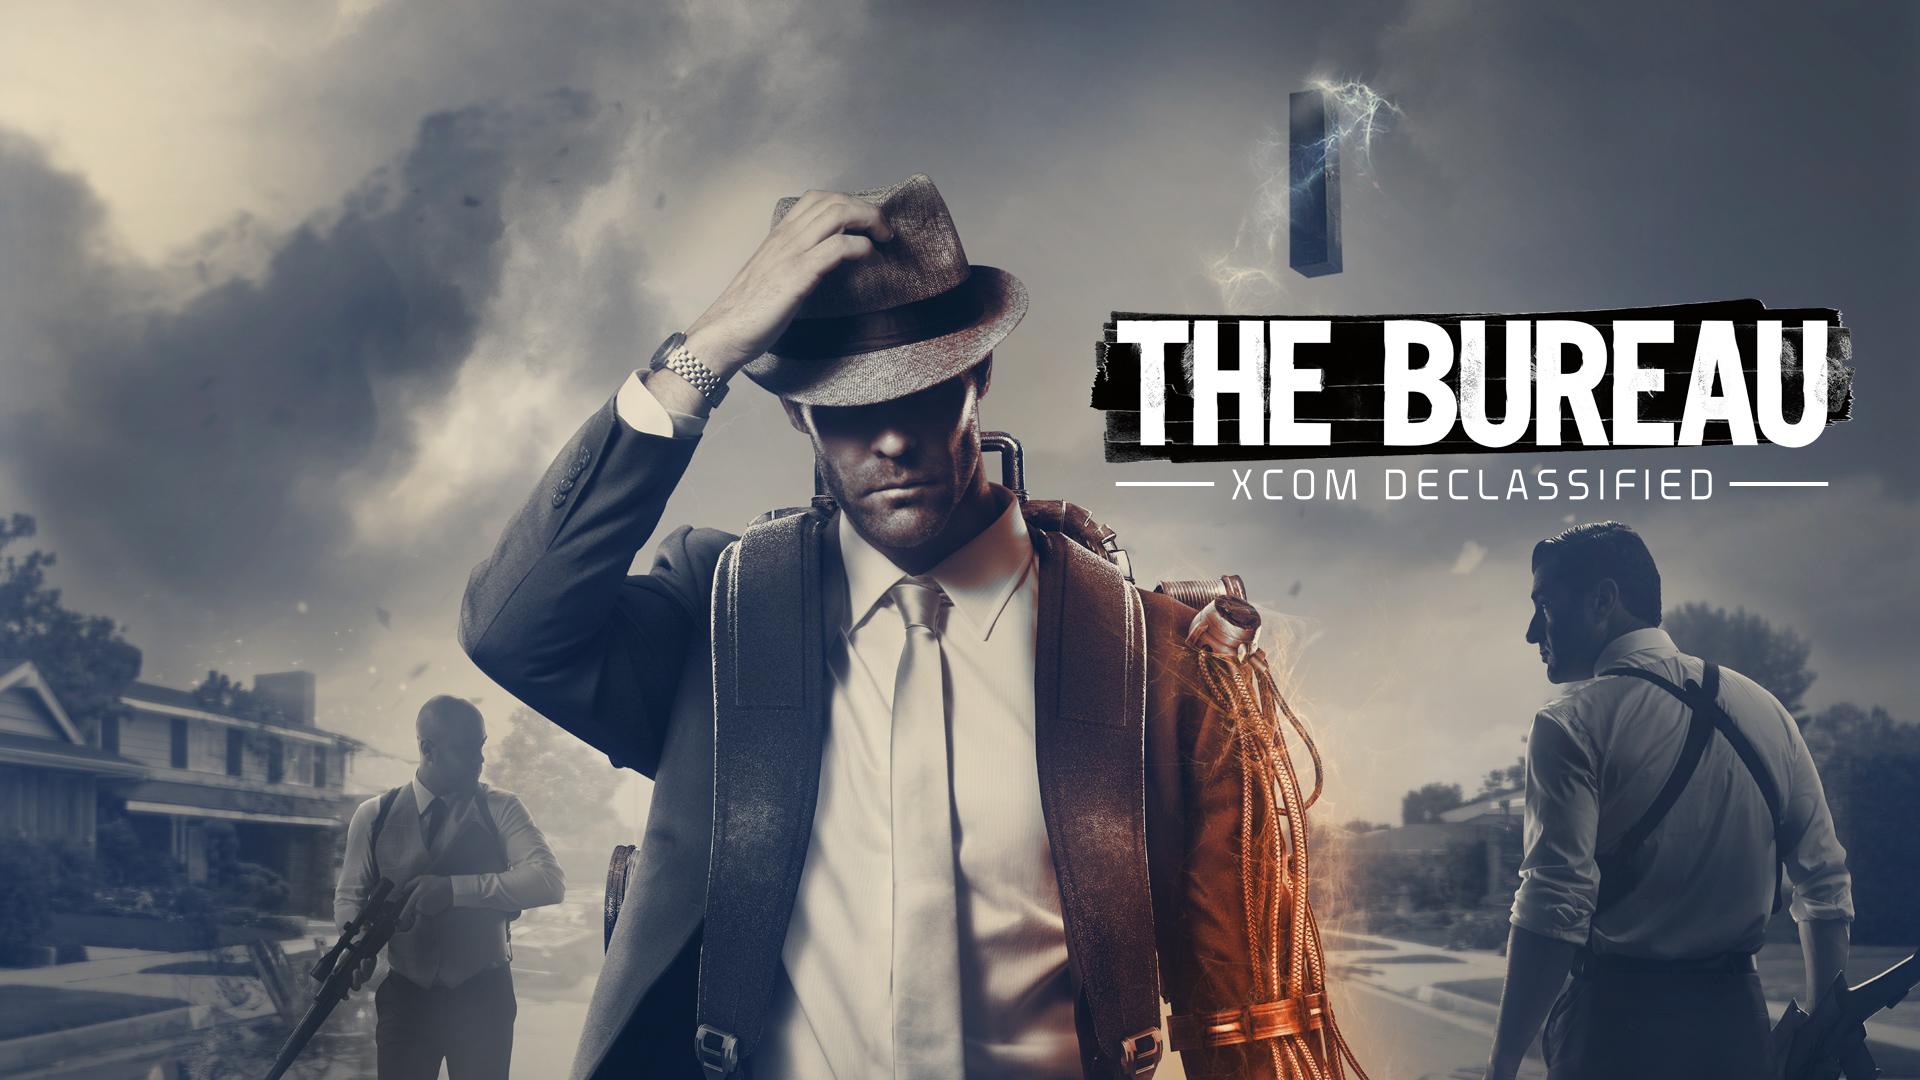 The Bureau XCOM Declassified 22301 HD wallpaper 1920x1080